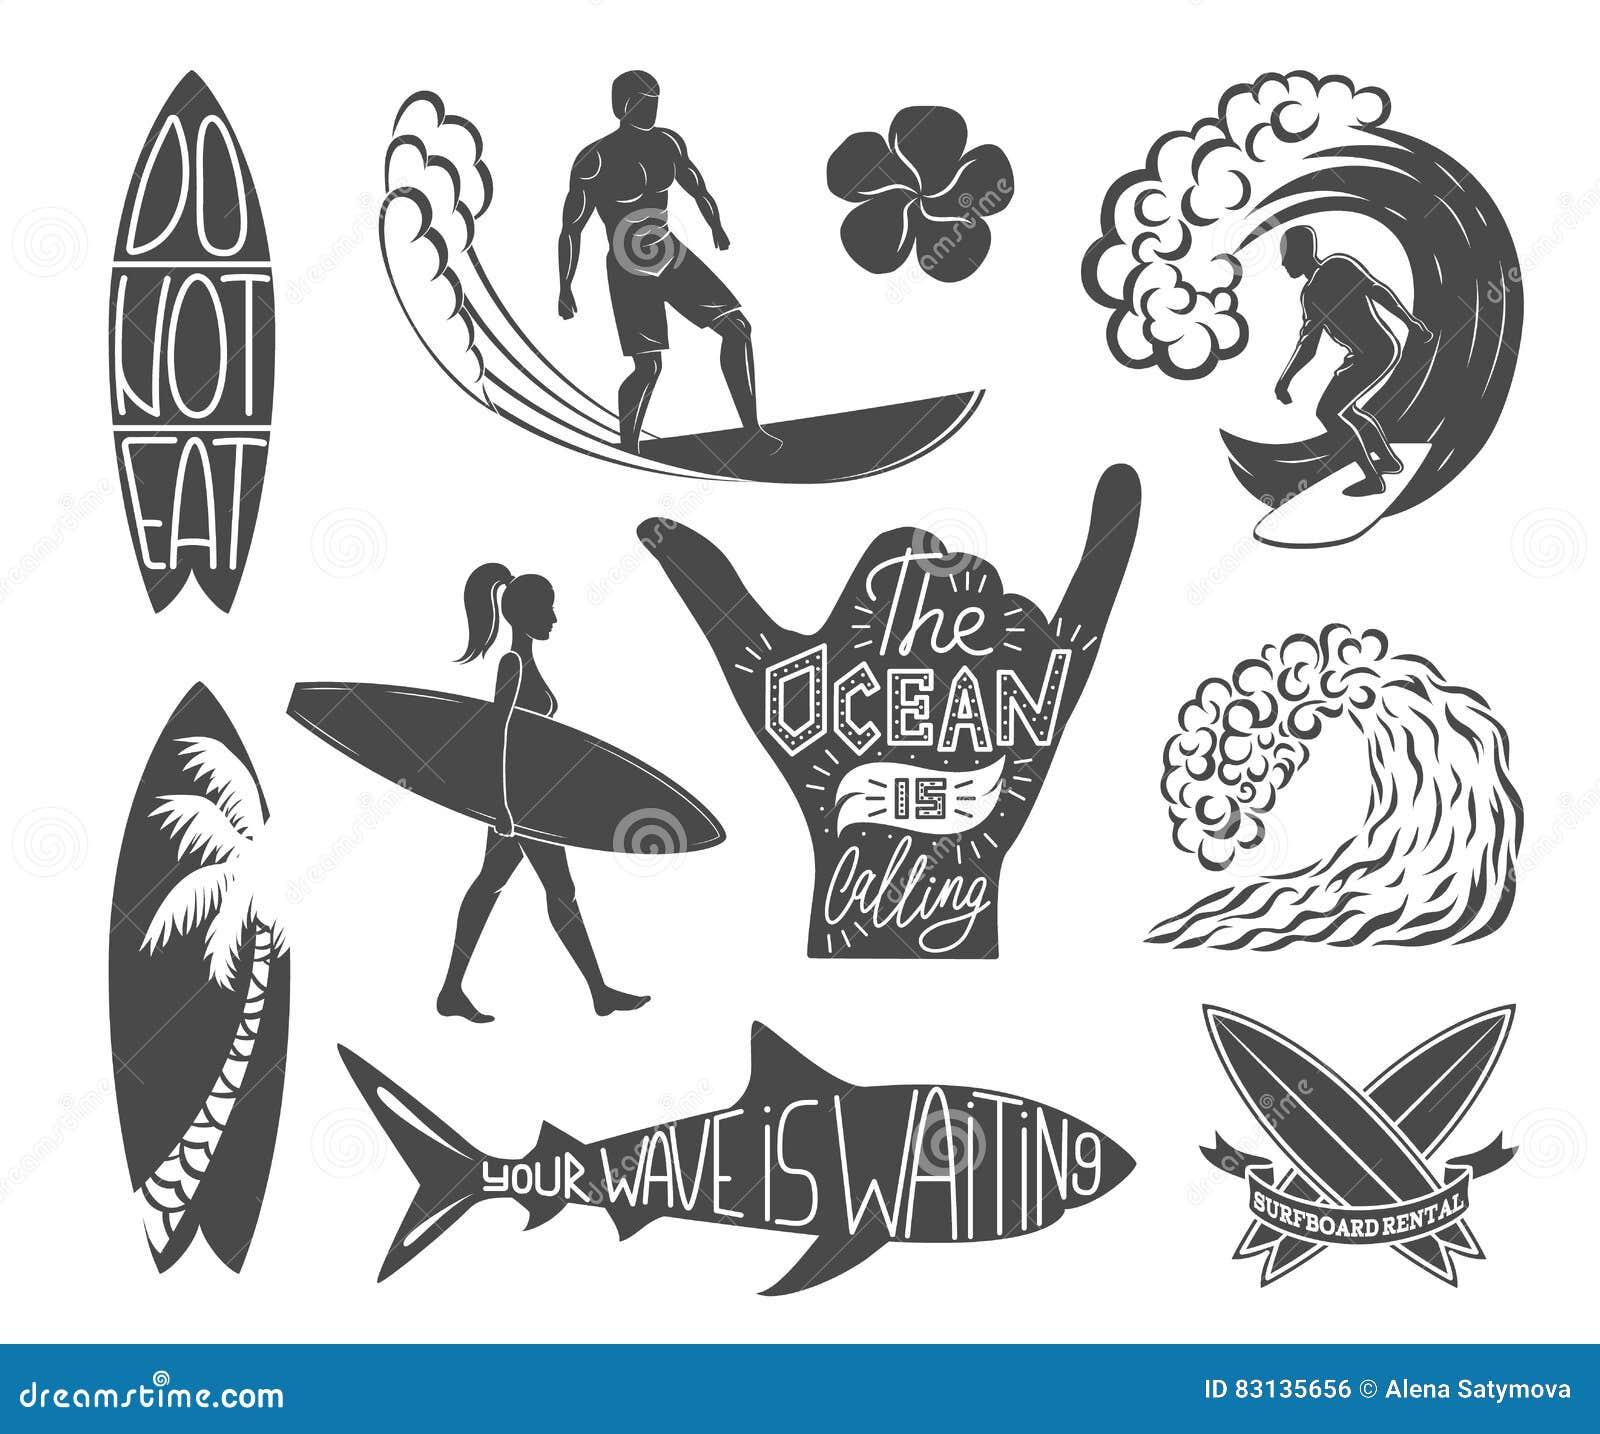 Set of surfing vintage design elements. Surf logo vector illustration. Surfboard logotypes. Retro style